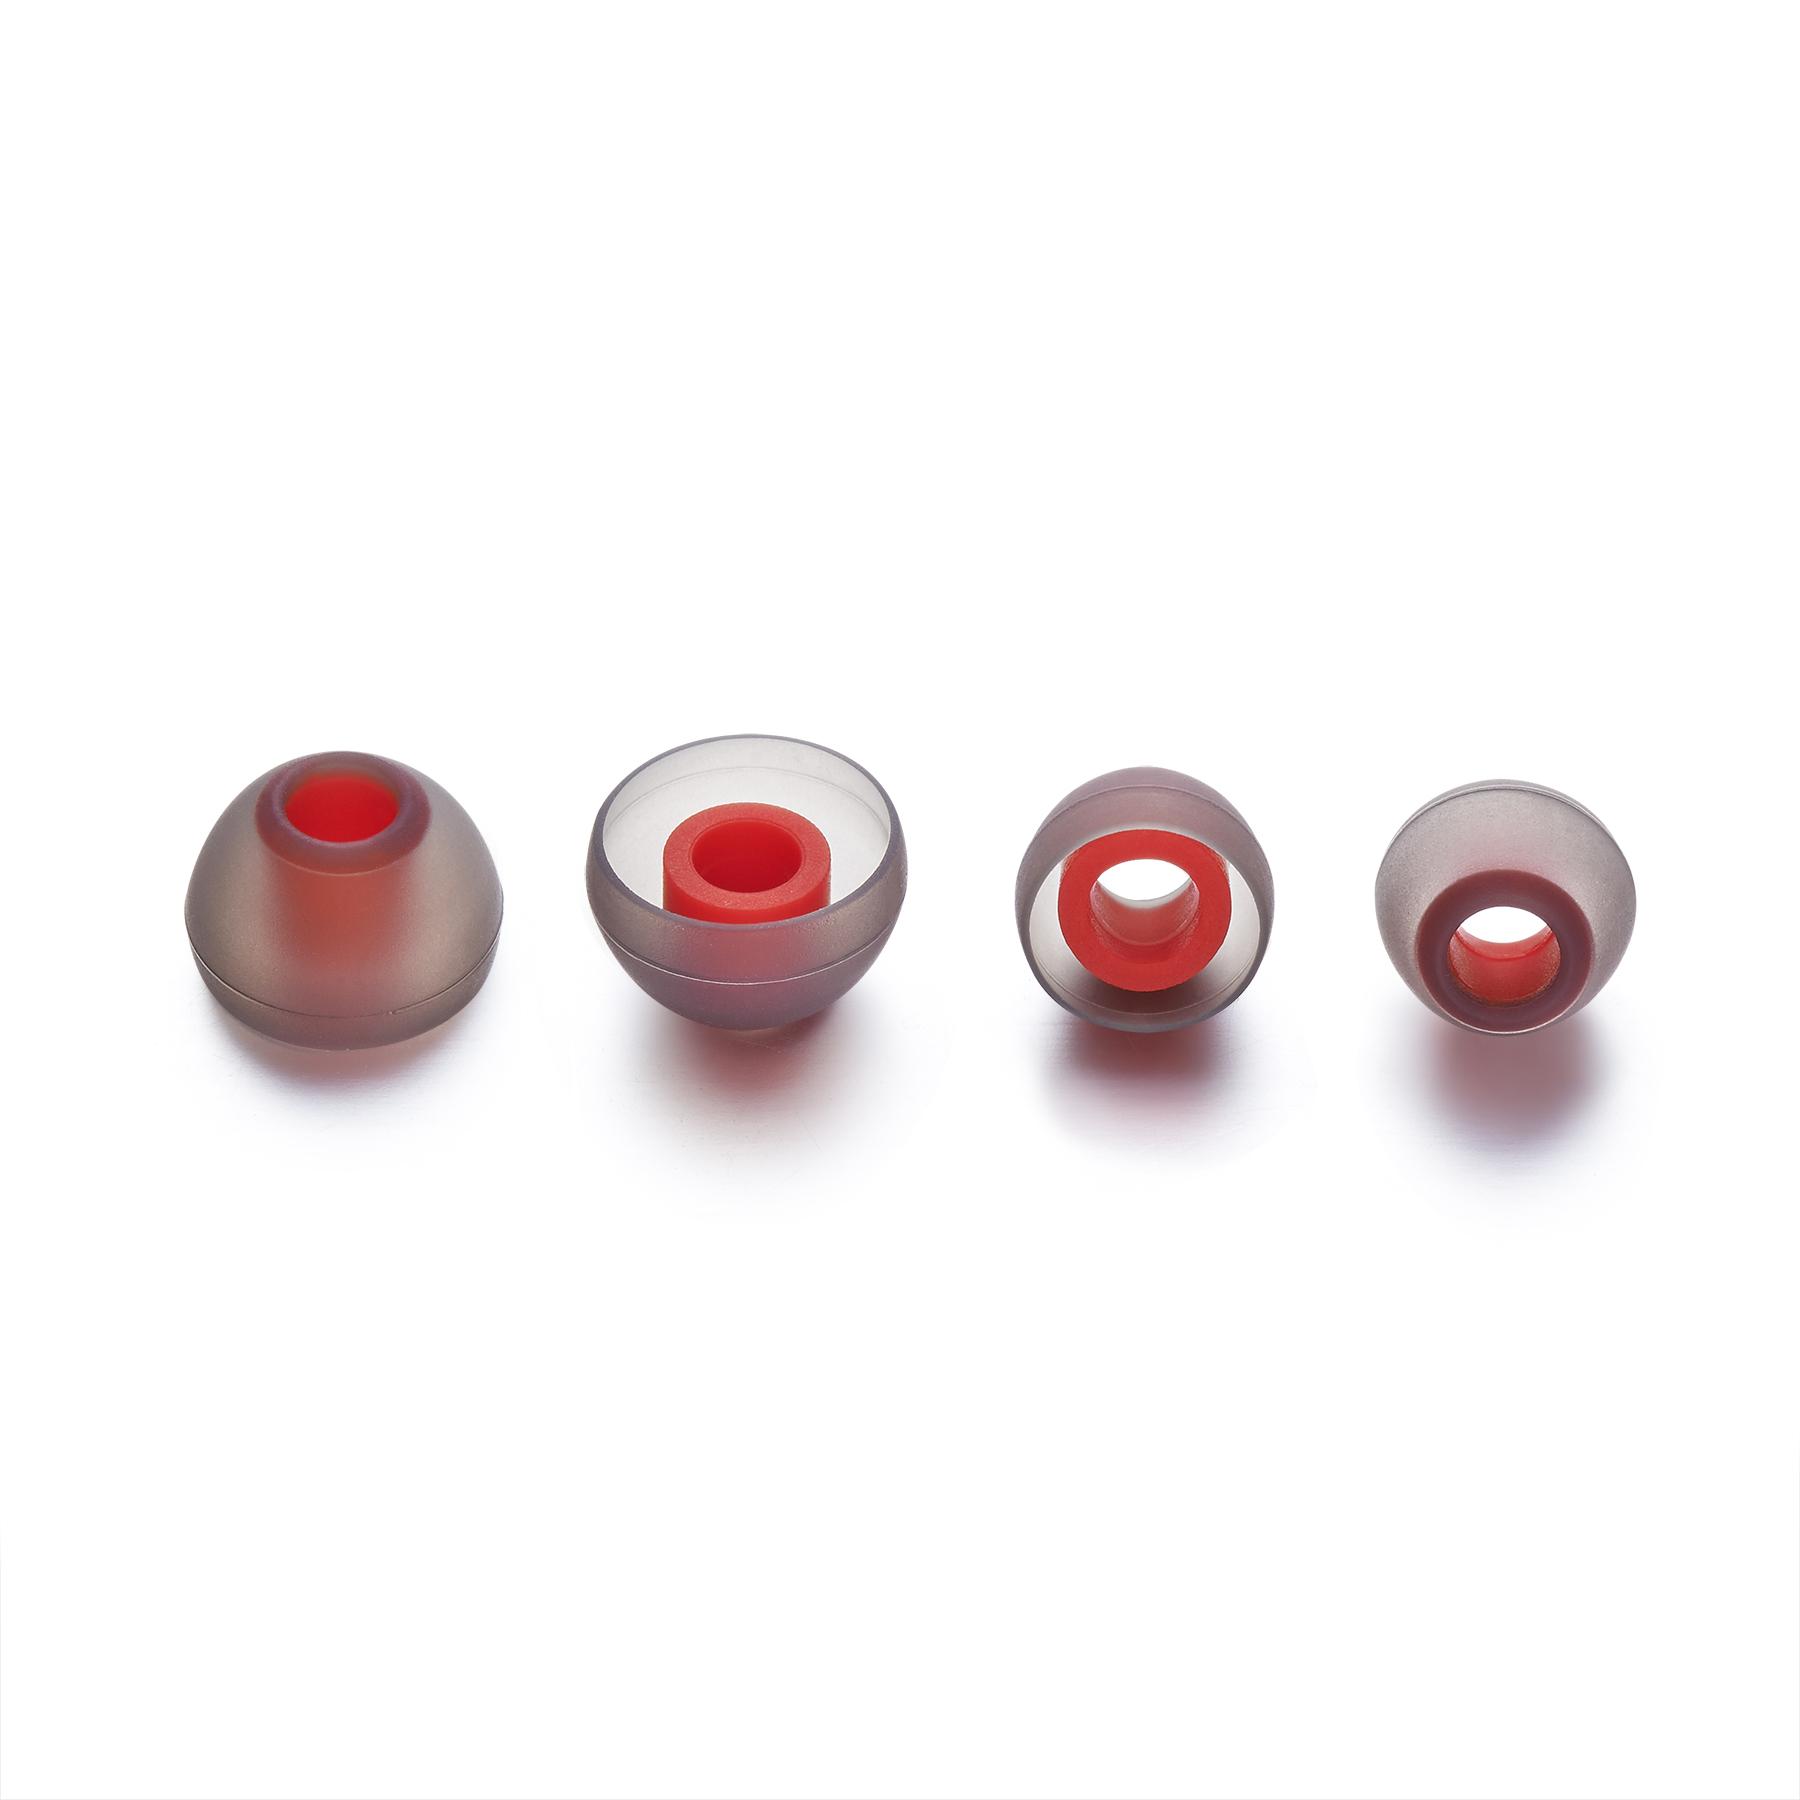 Z:ero (Red)